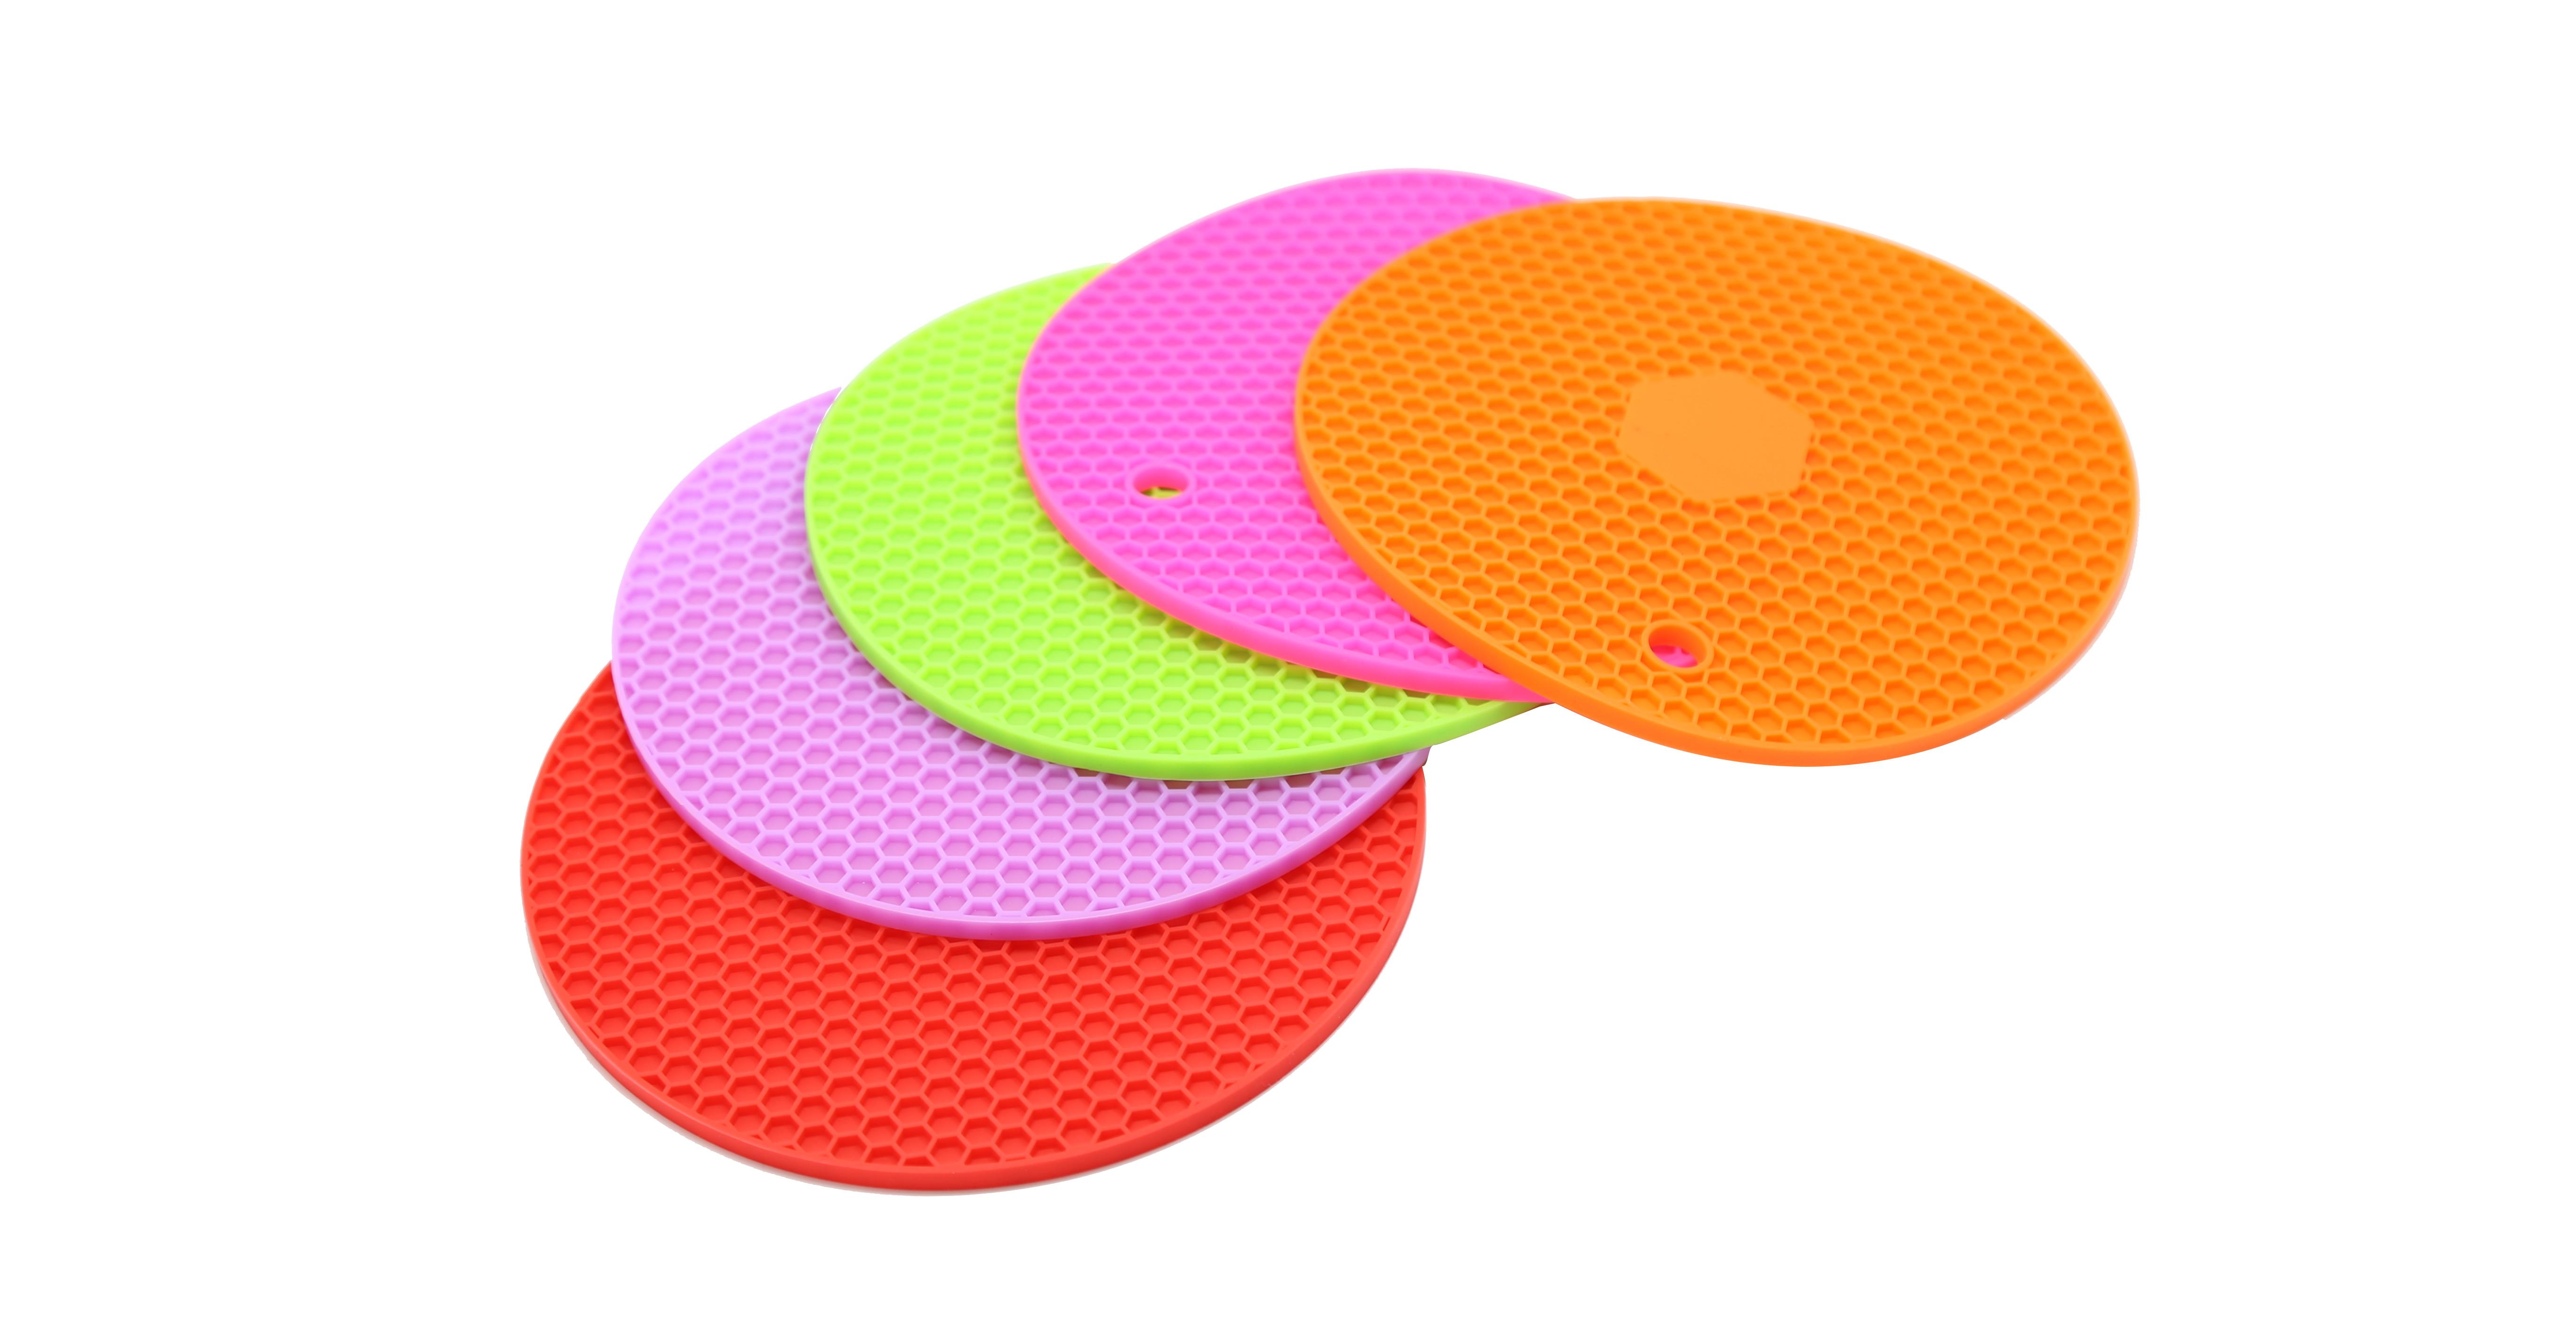 Honeycomb silicone heat pad use